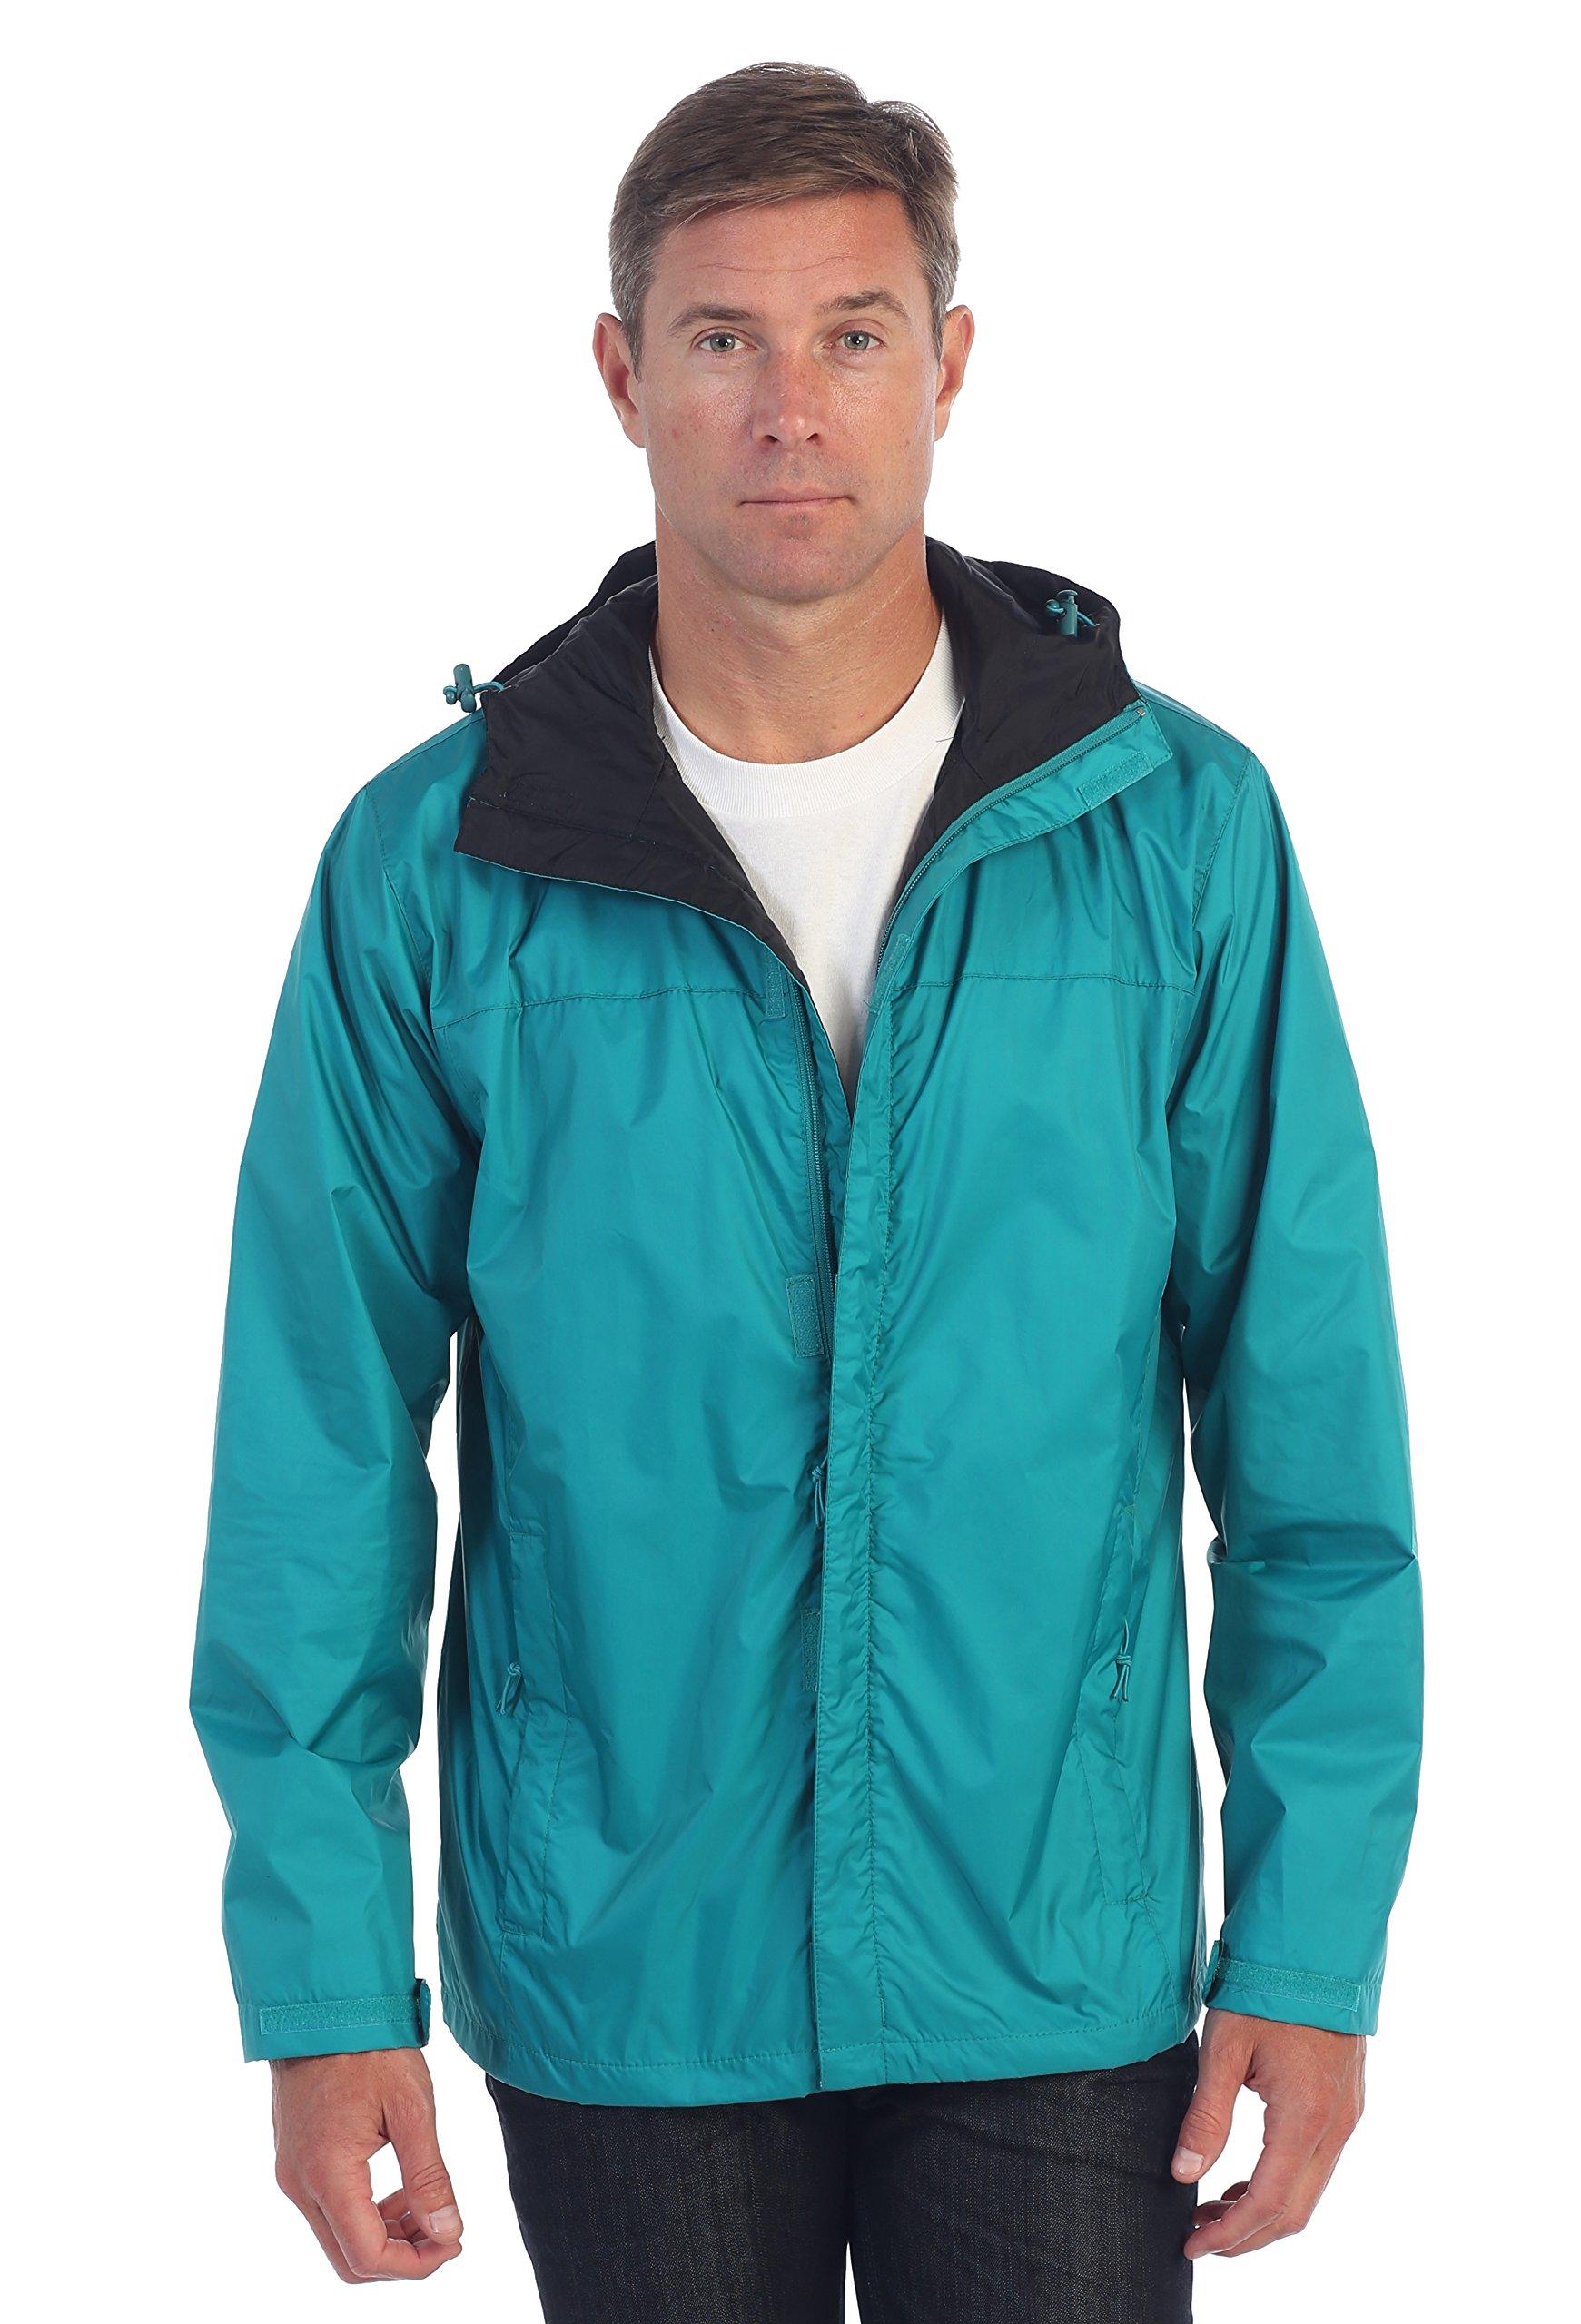 Gioberti Men's Waterproof Rain Jacket, Green, XL